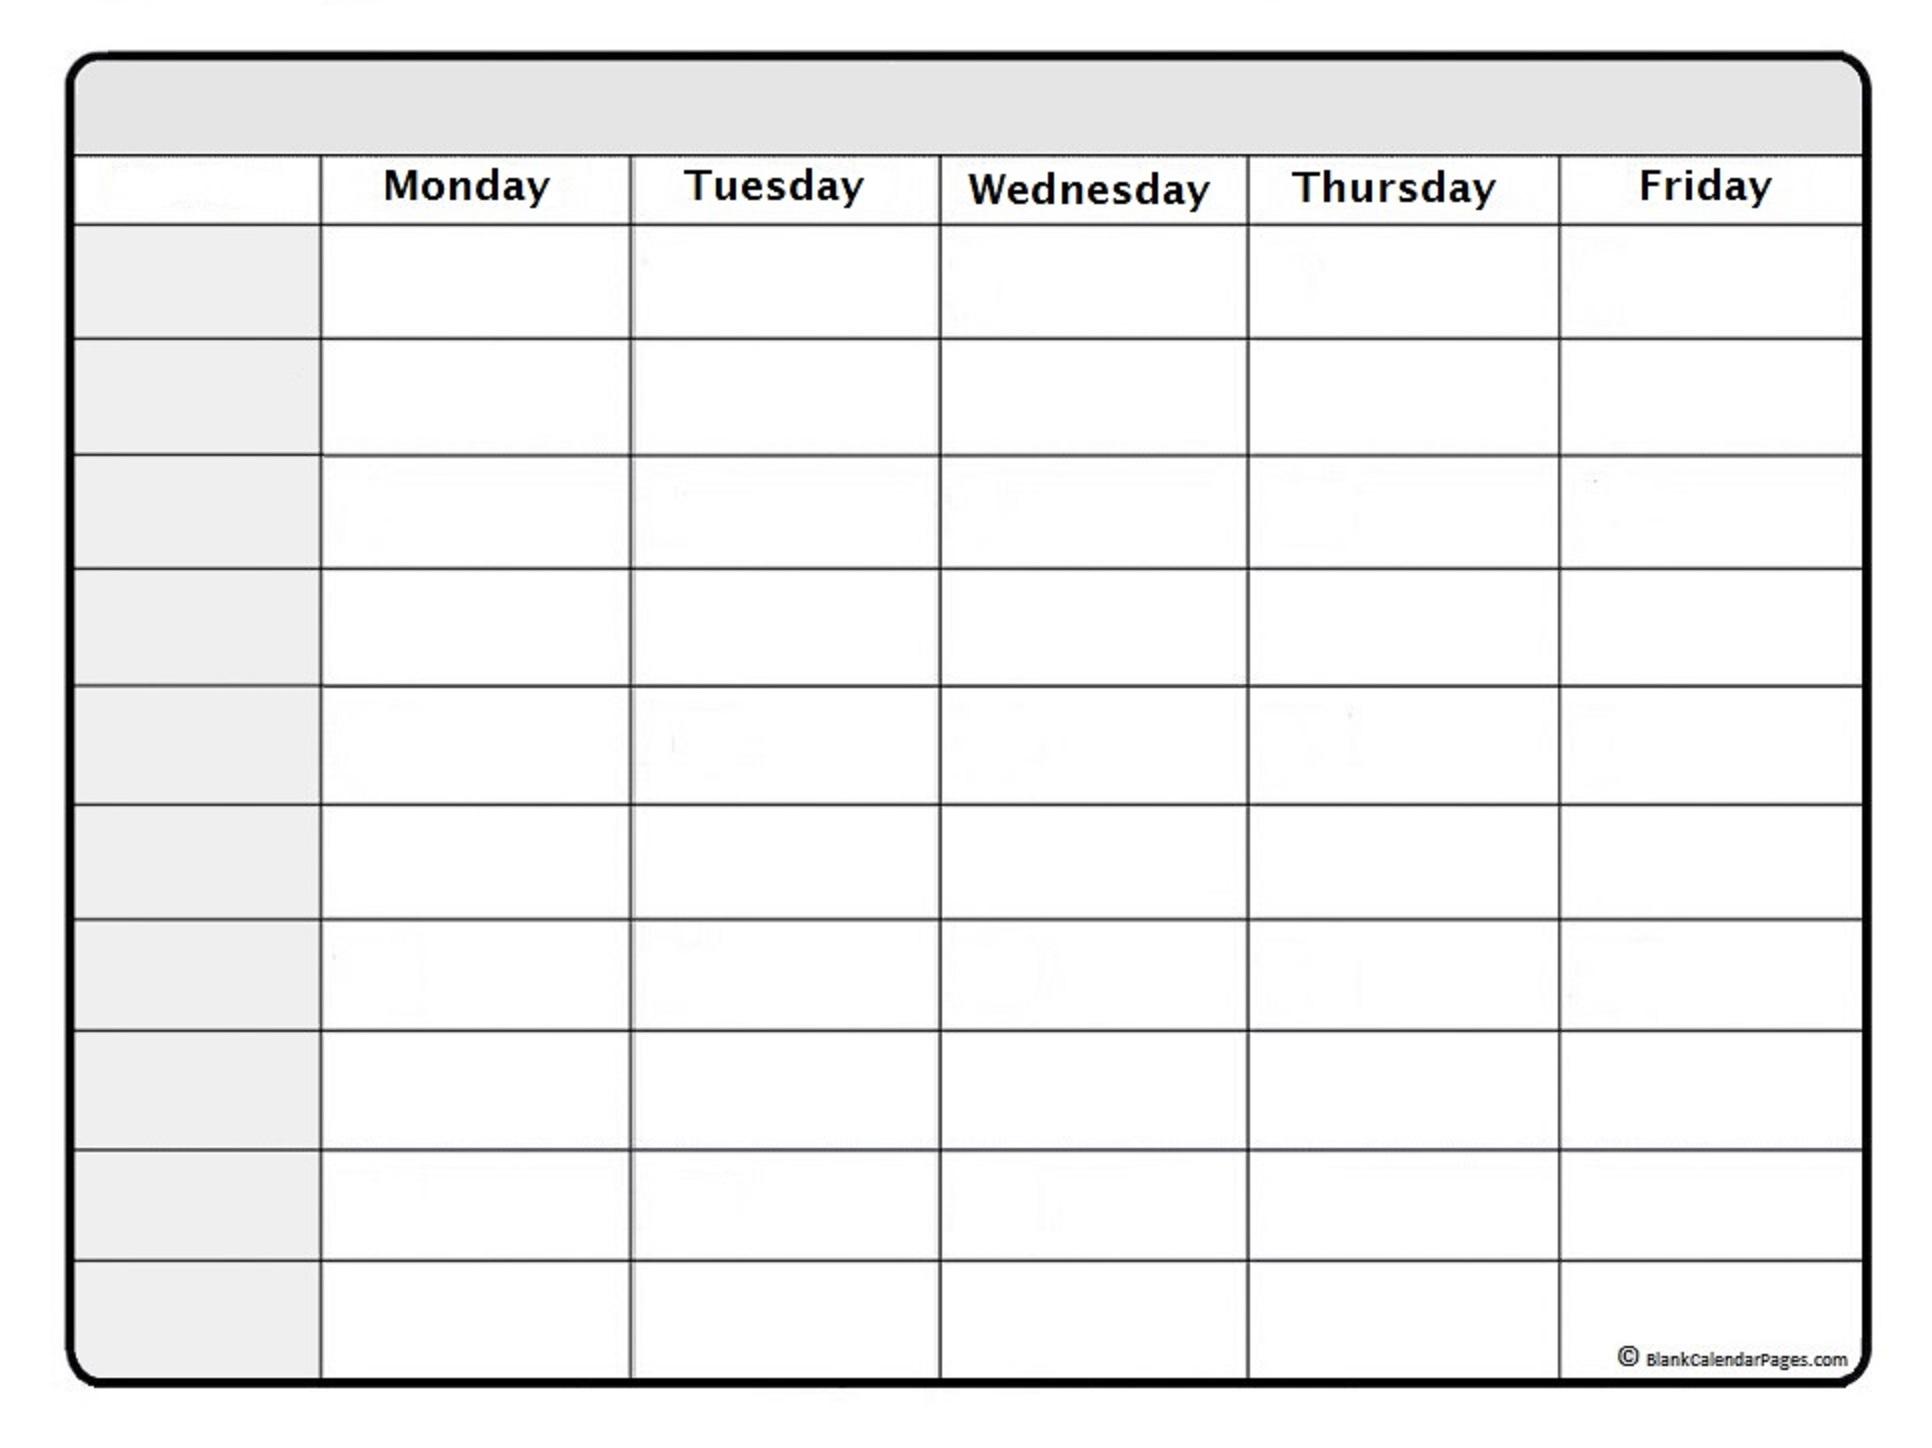 August 2019 Weekly Calendar   August 2019 Weekly Calendar Template for Blank 6 Week Calendar Template